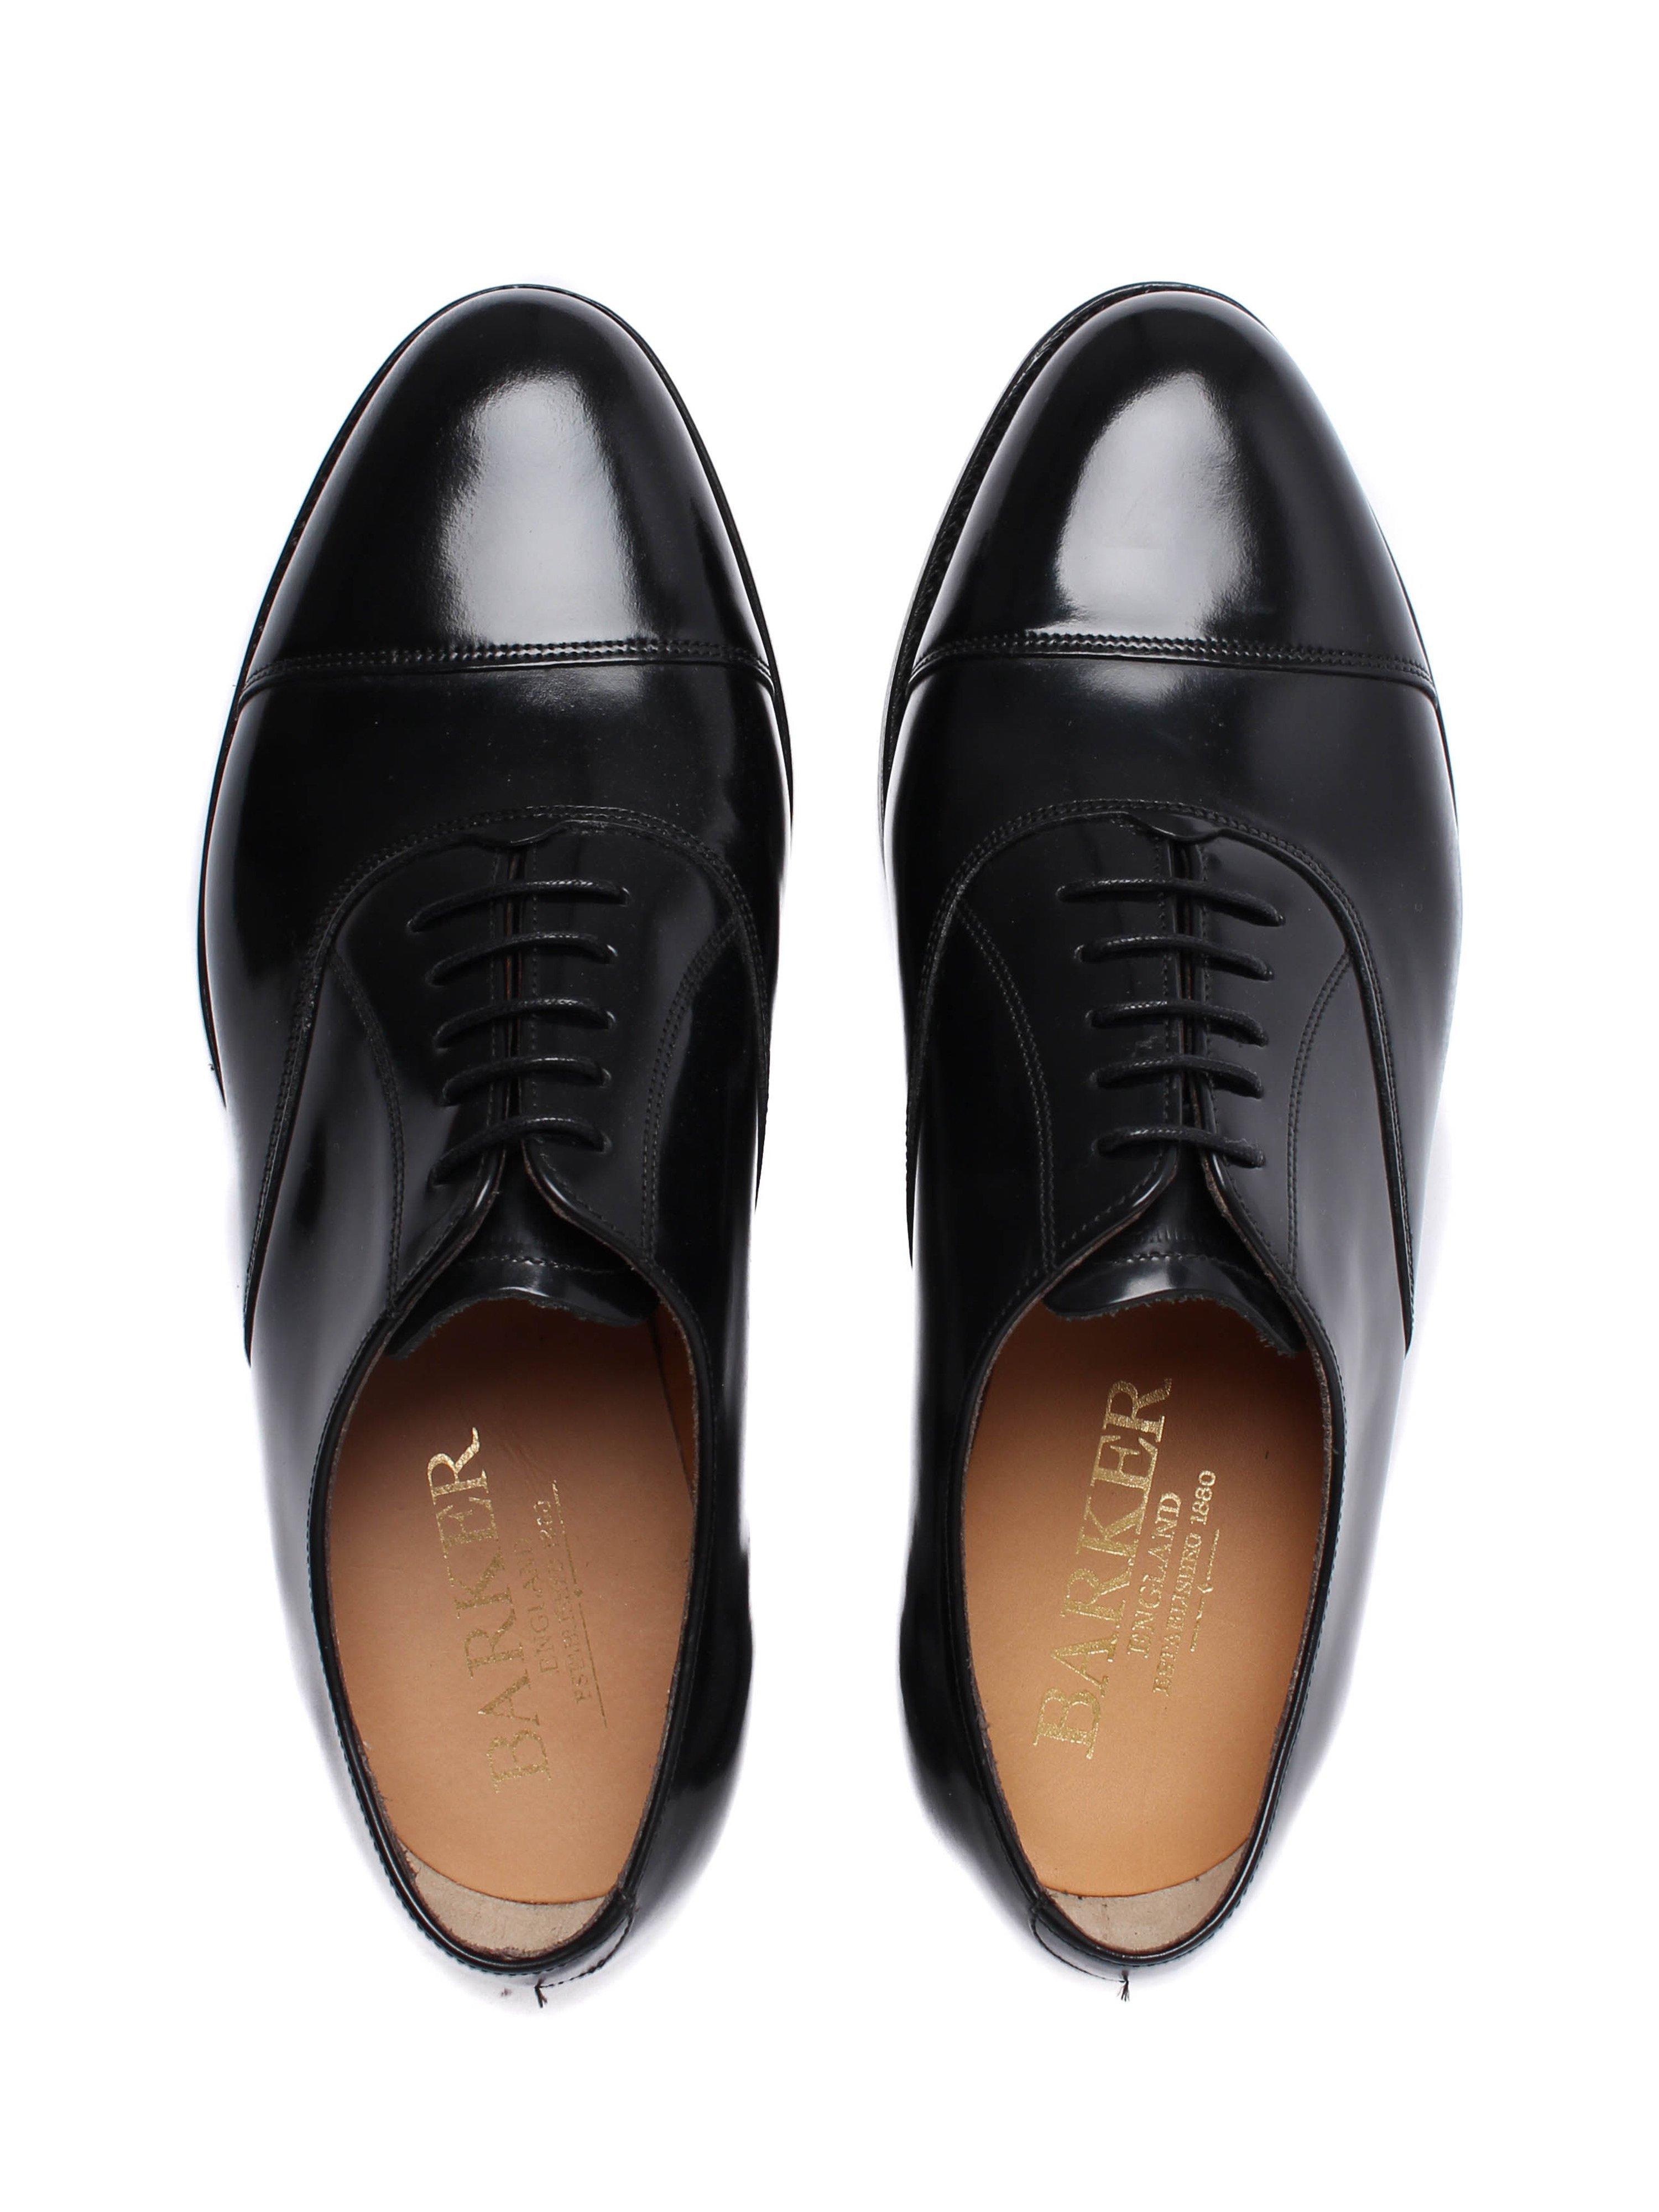 Barker Men's Arnold Leather Cap-Toe Derby Shoes - Black